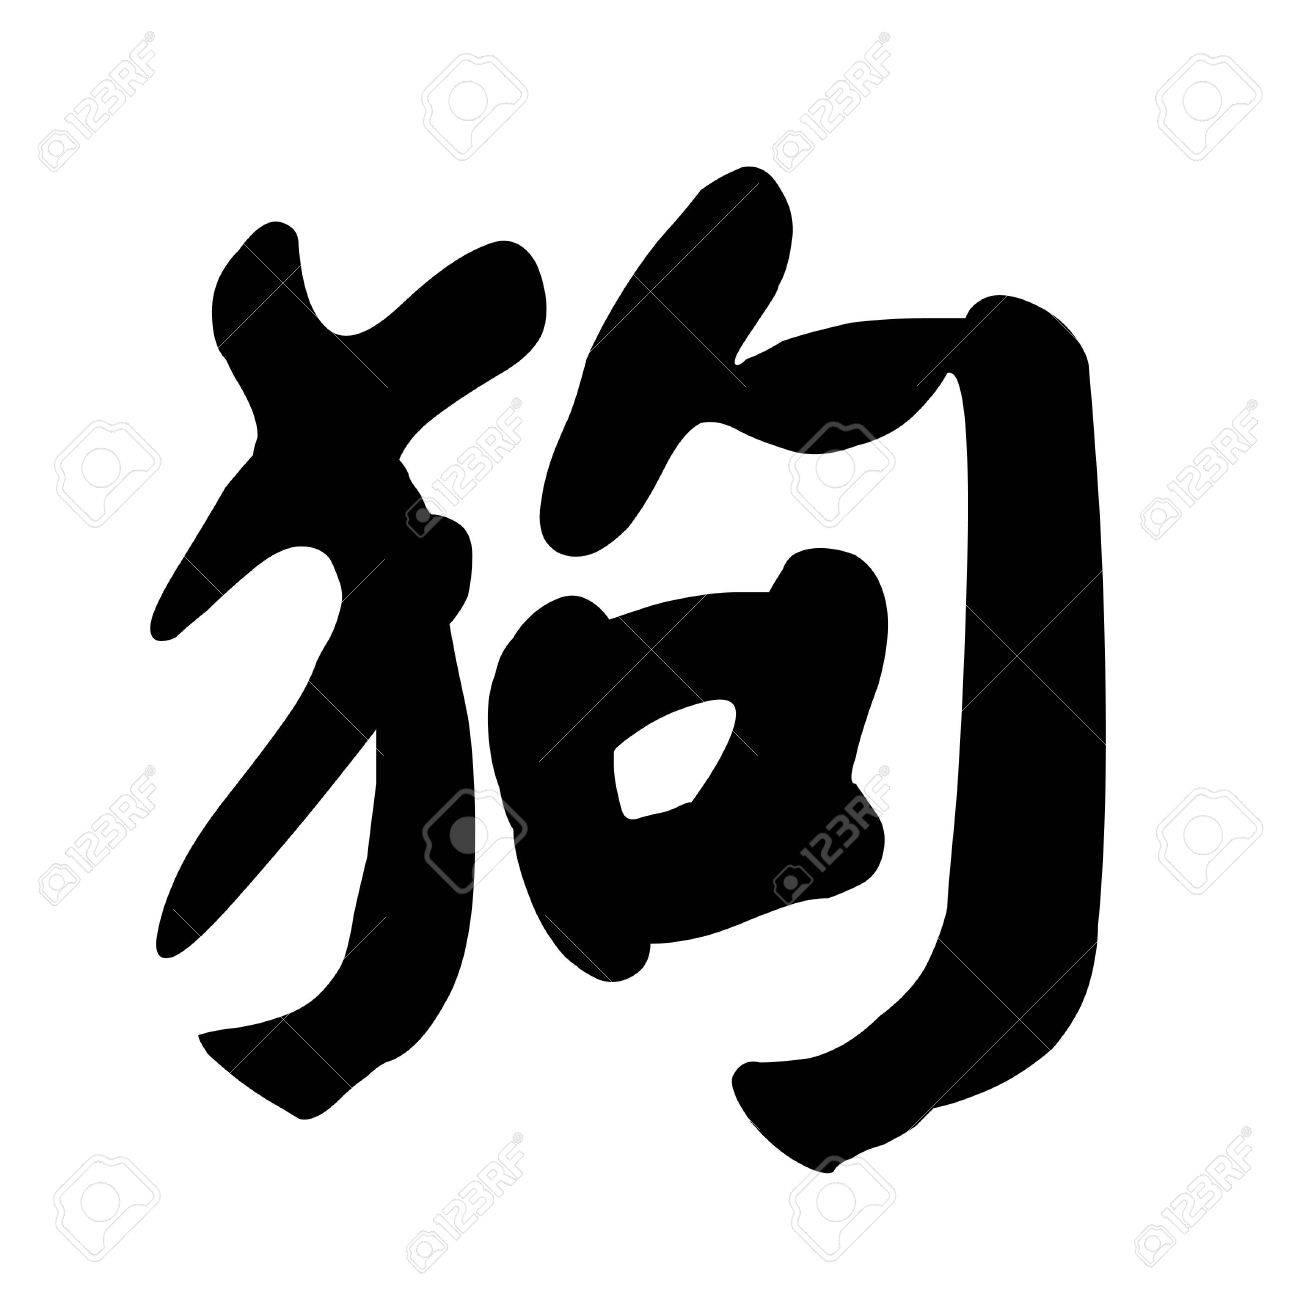 Chinese Calligraphy Character dog Stock Photo - 7678489